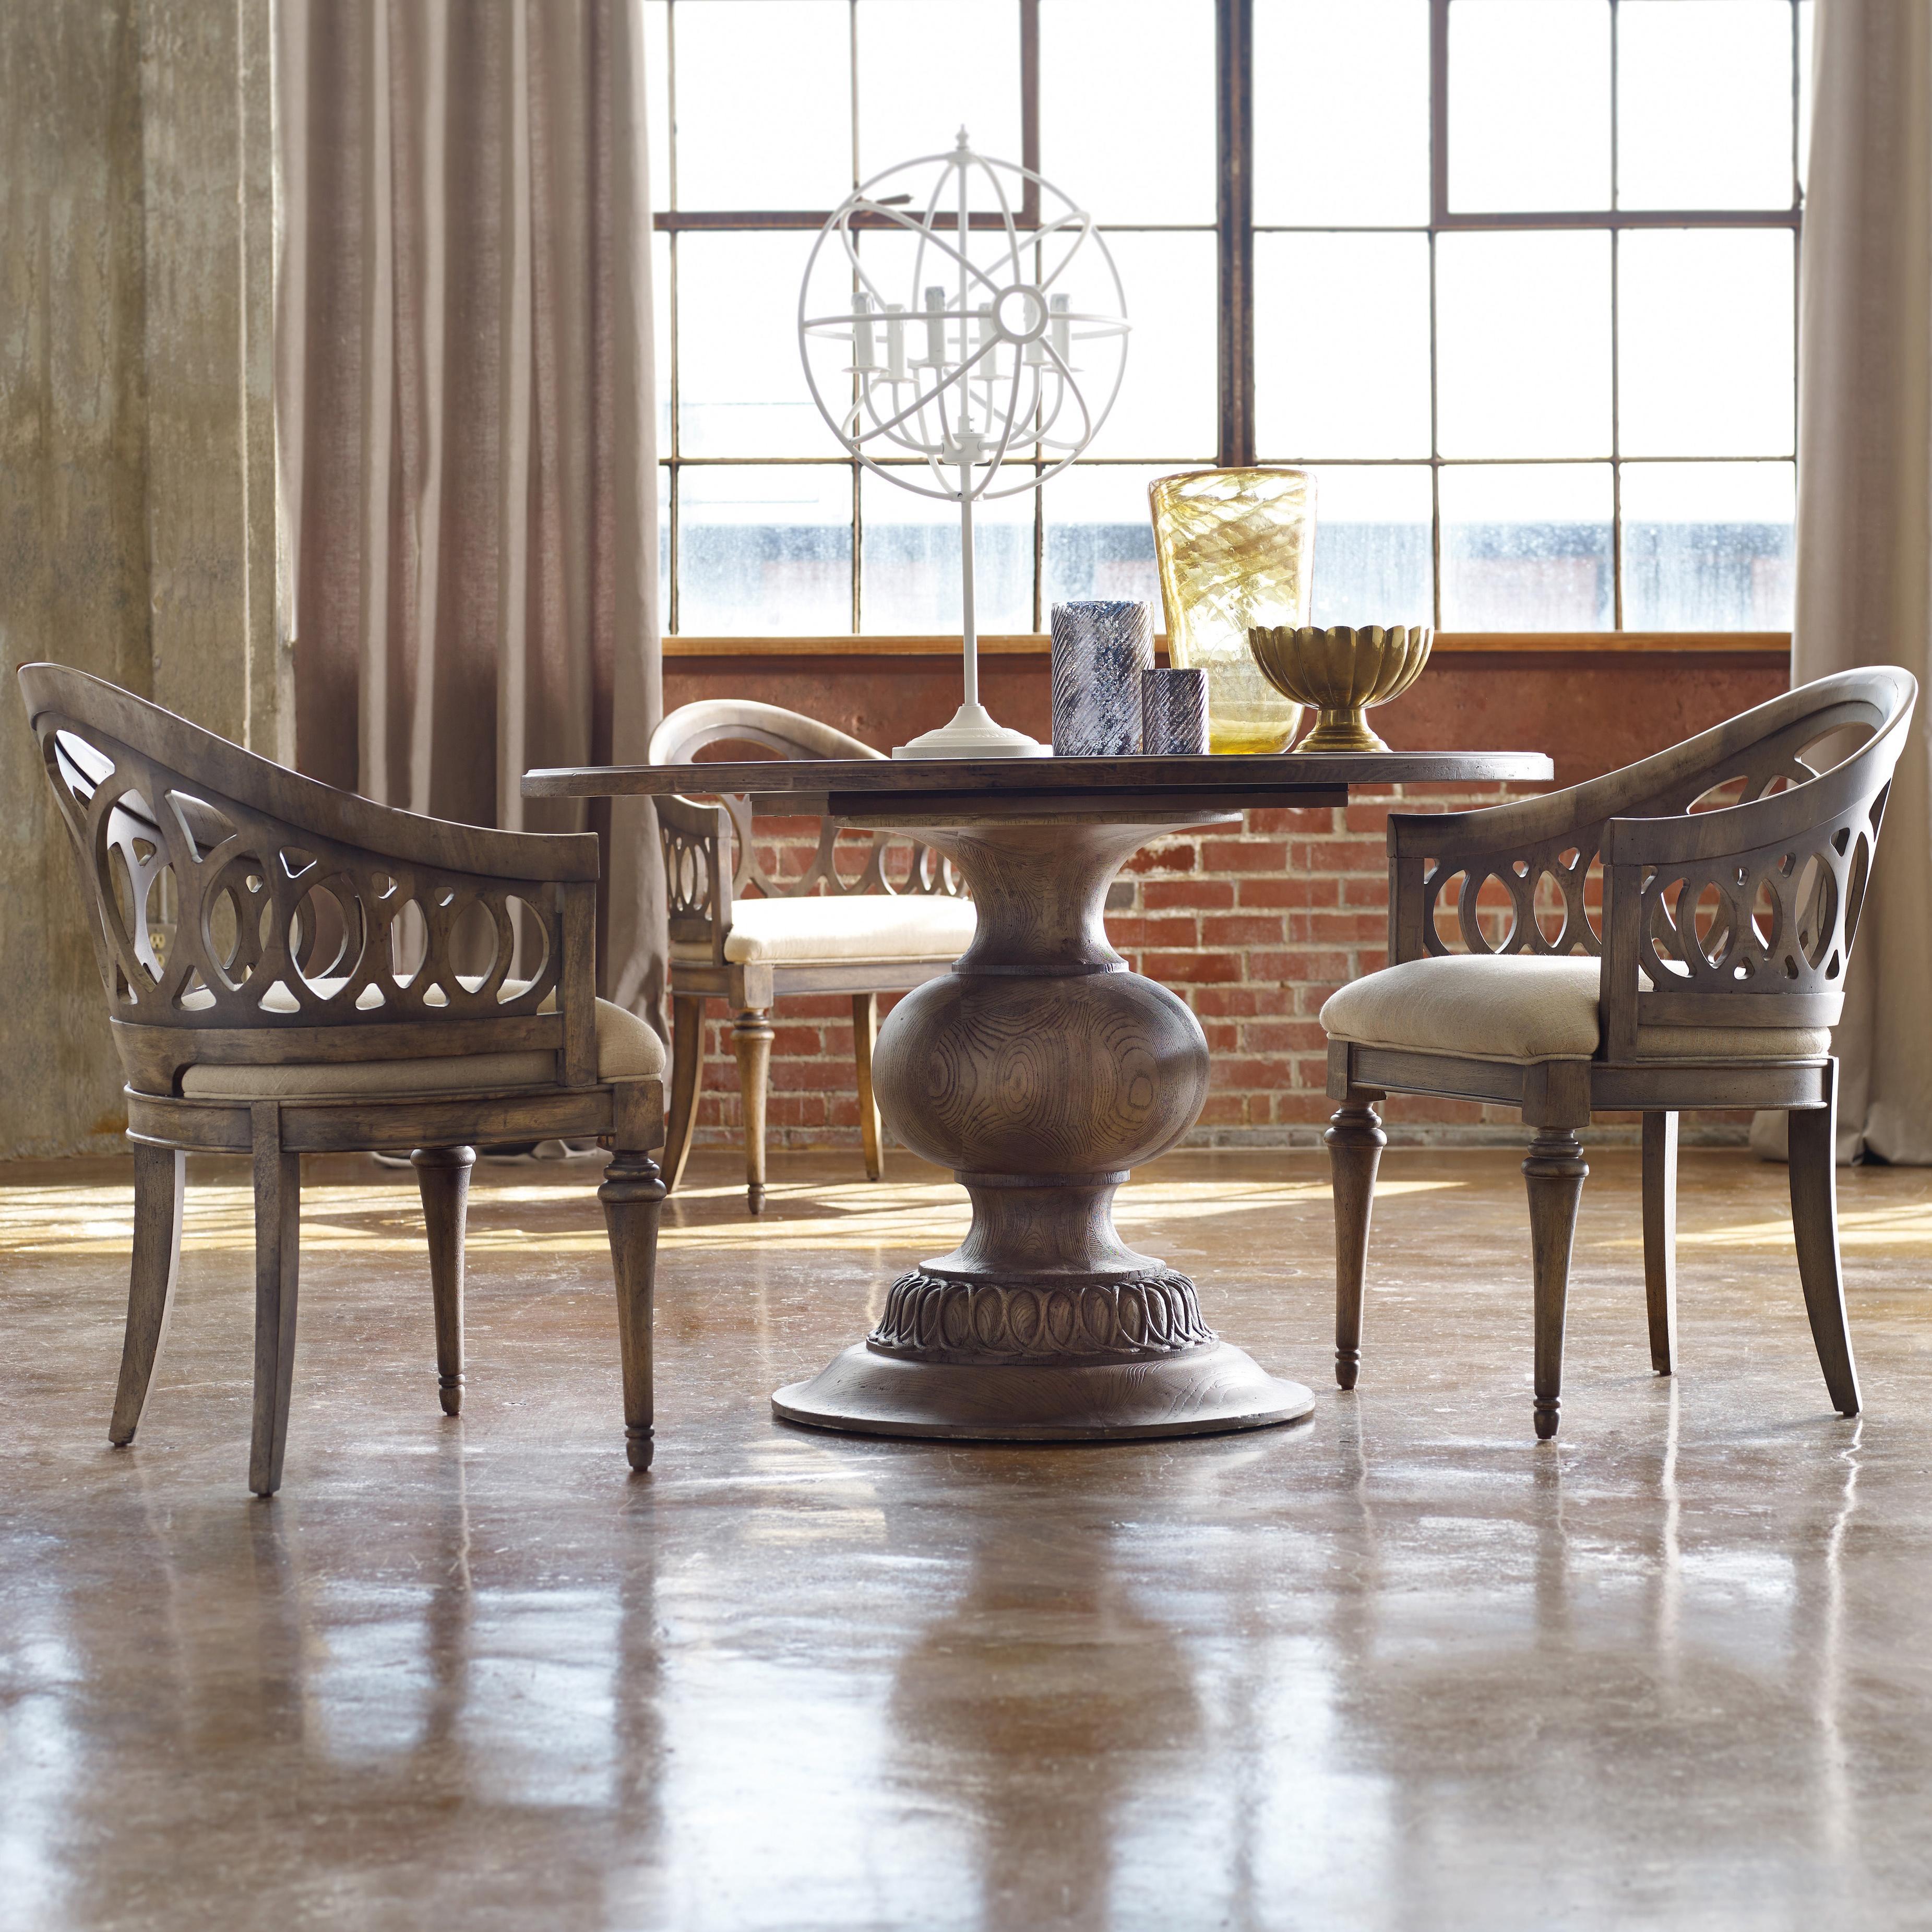 Hooker Furniture Mélange 3 Piece Cambria Dining Set - Item Number: 638-75004+2x5